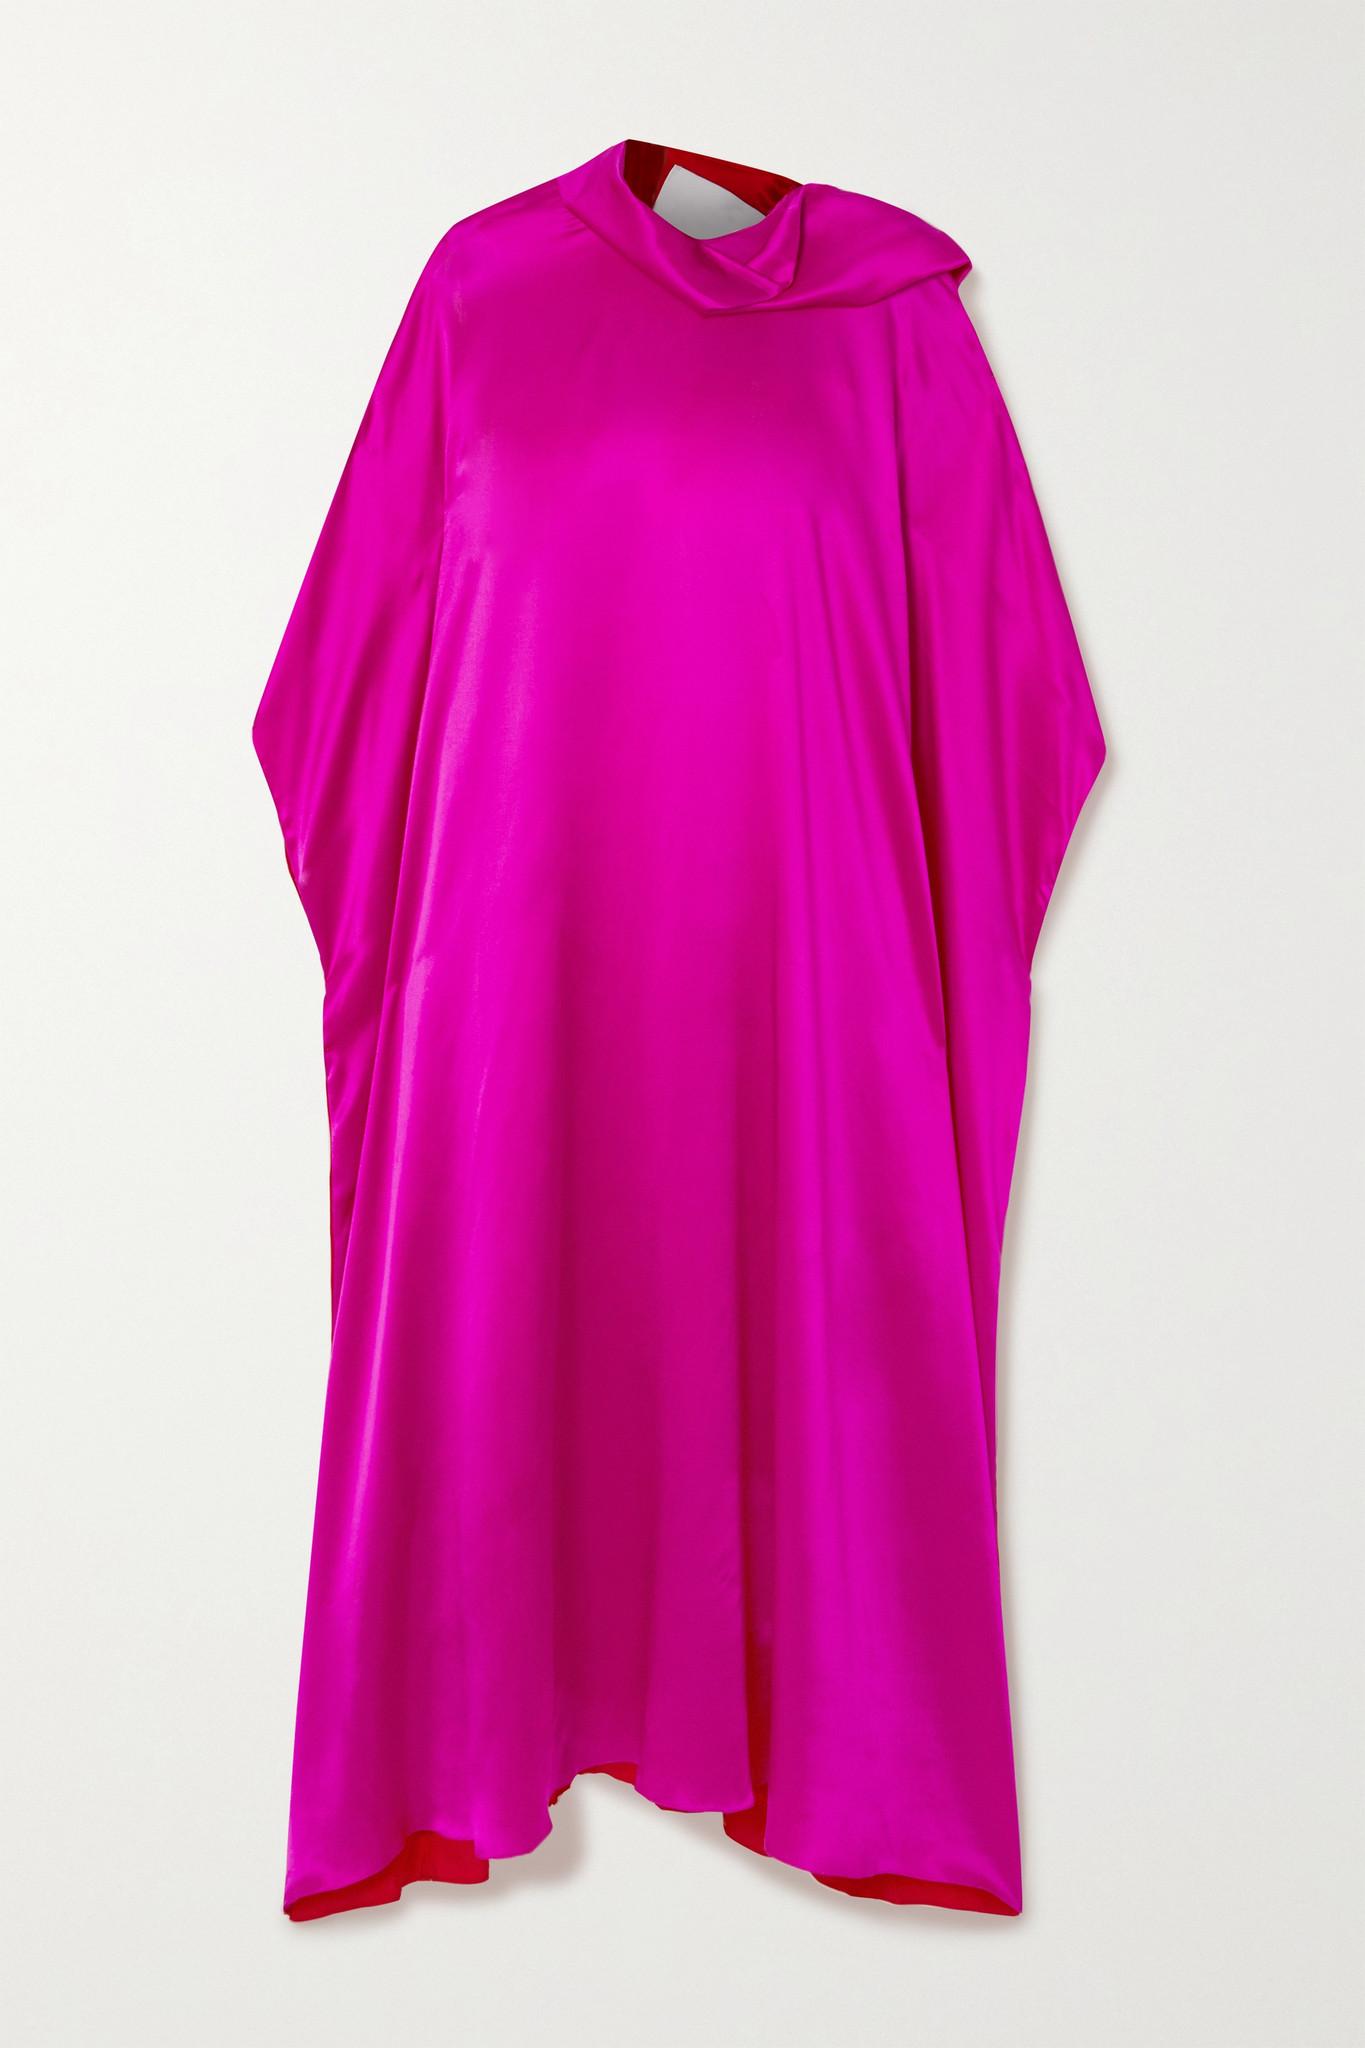 HALPERN - 系带细节双色真丝混纺缎布超长连衣裙 - 粉红色 - FR34